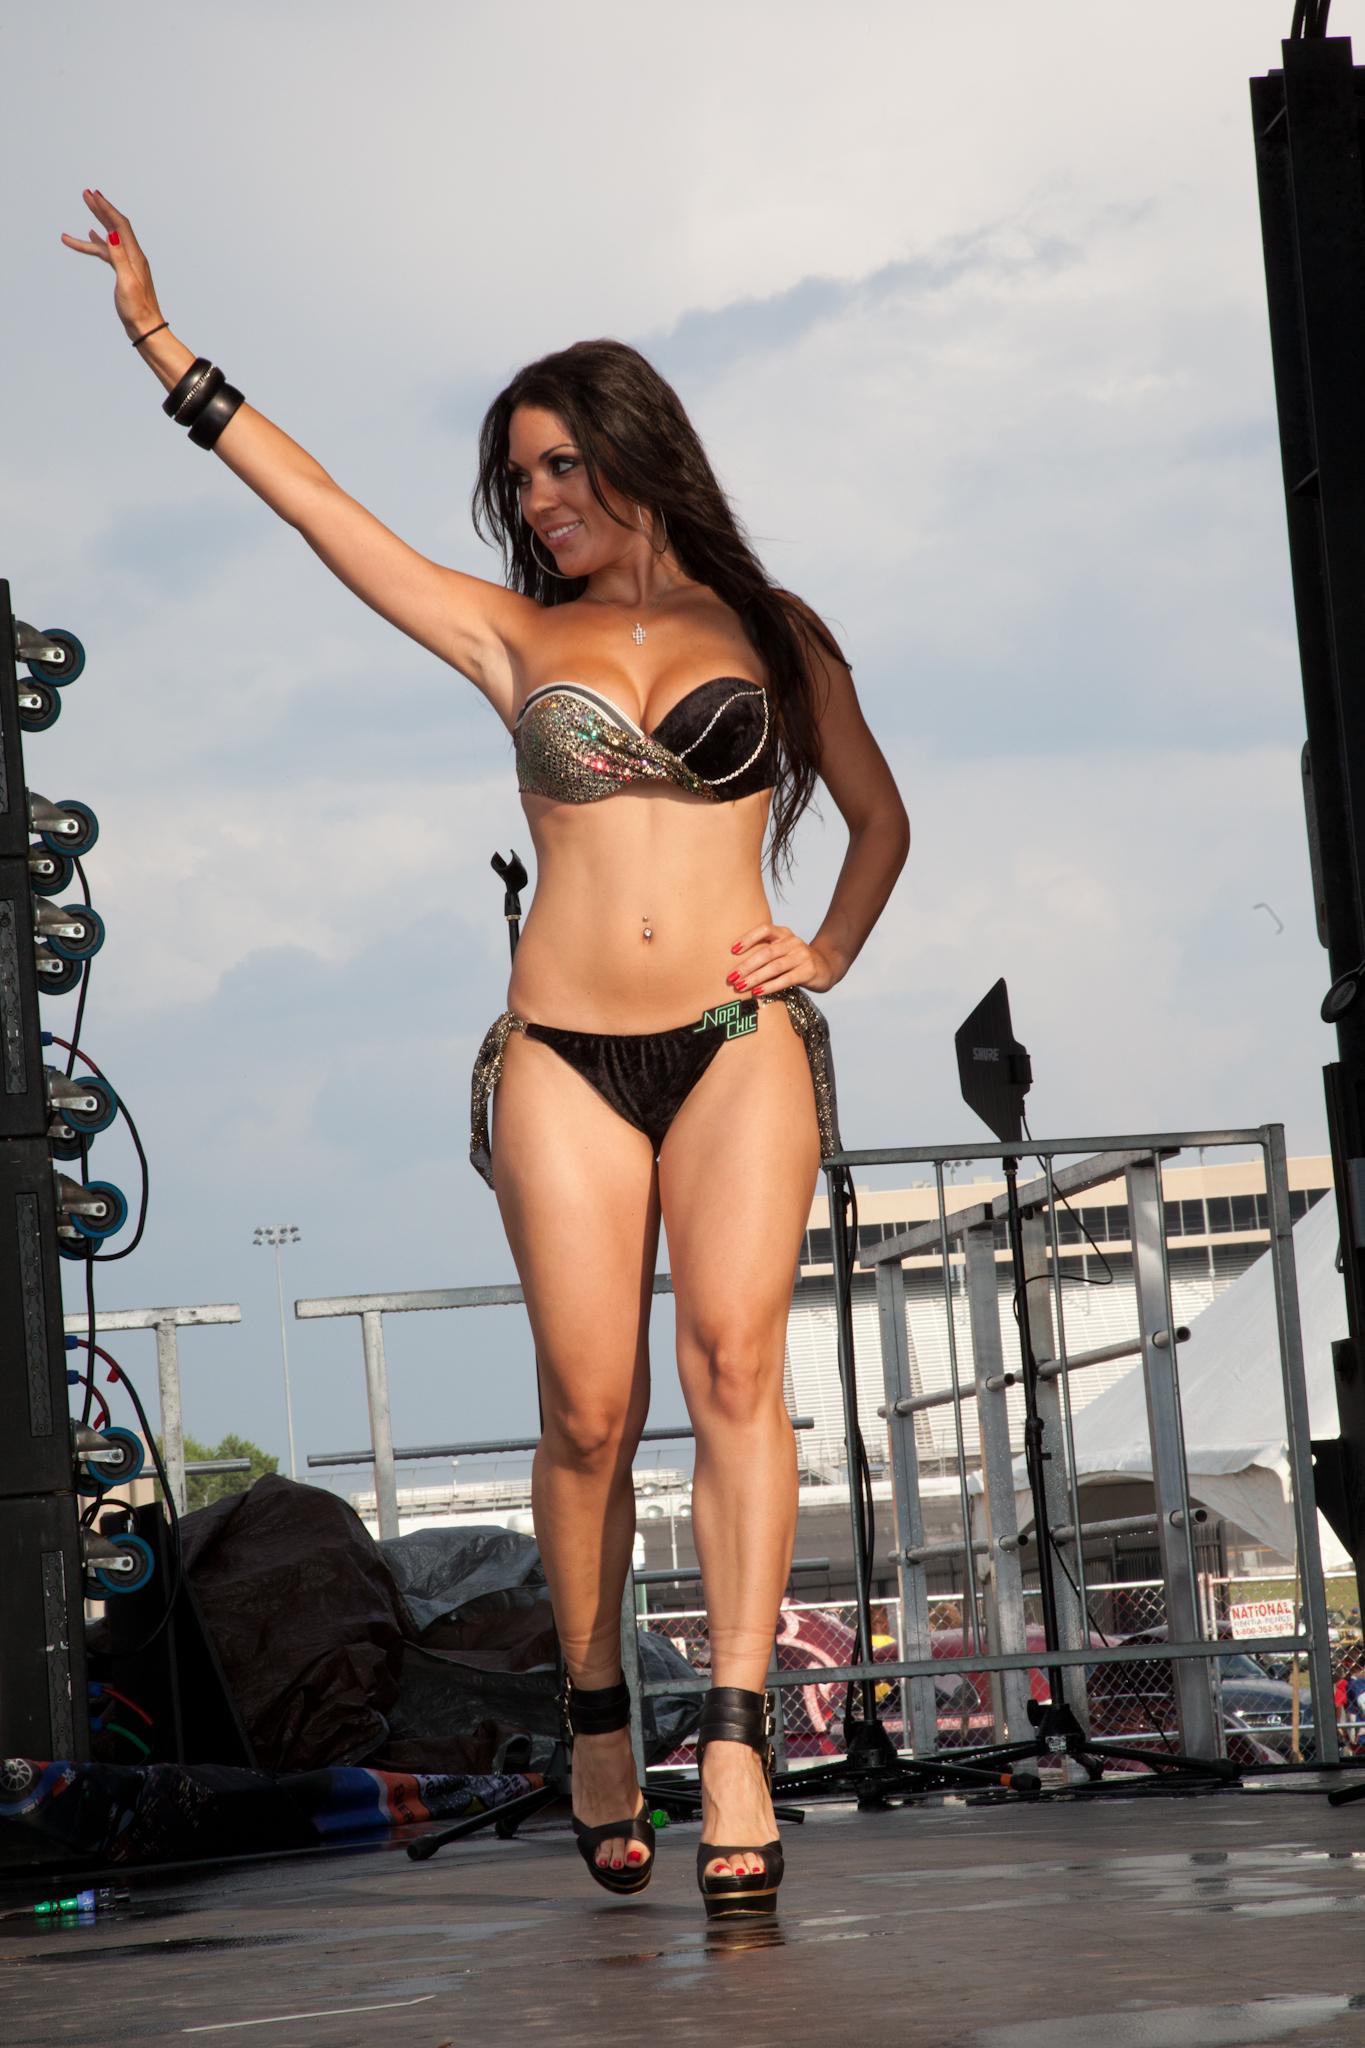 Bikini hot import contest nights